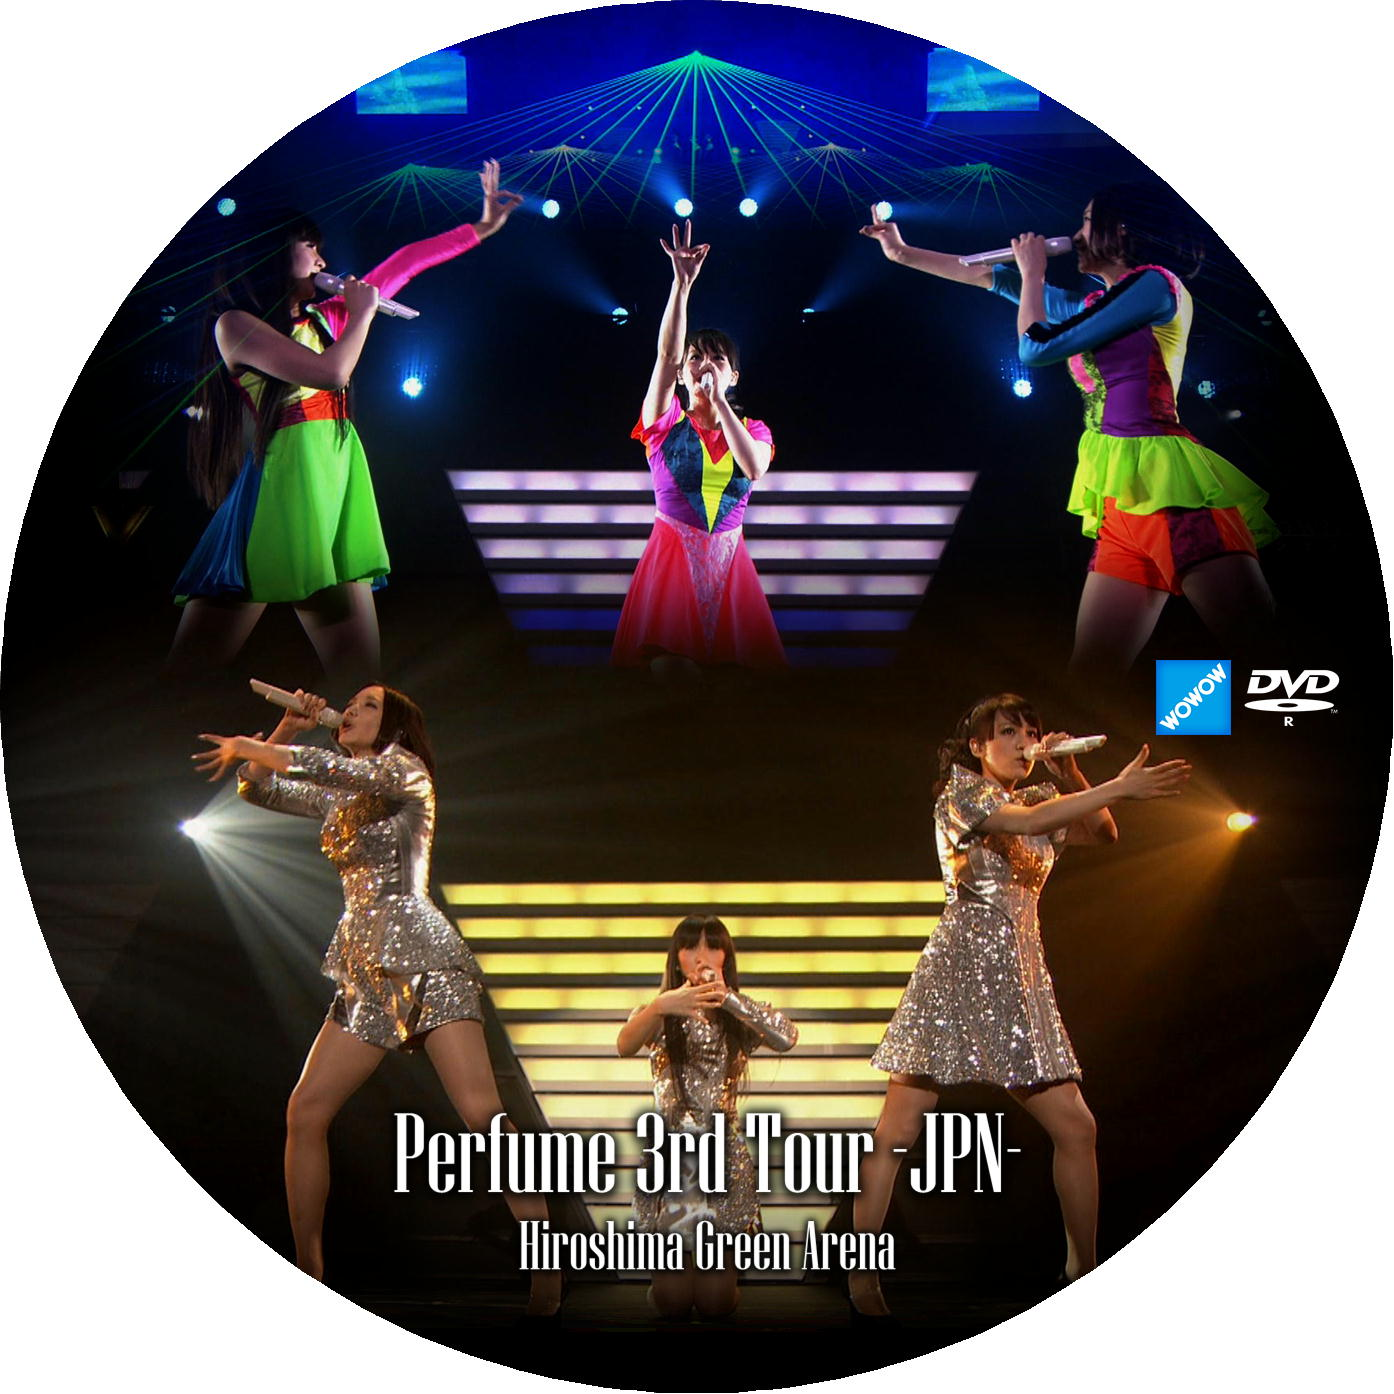 Perfume 3rd Tour JPN DVDラベル